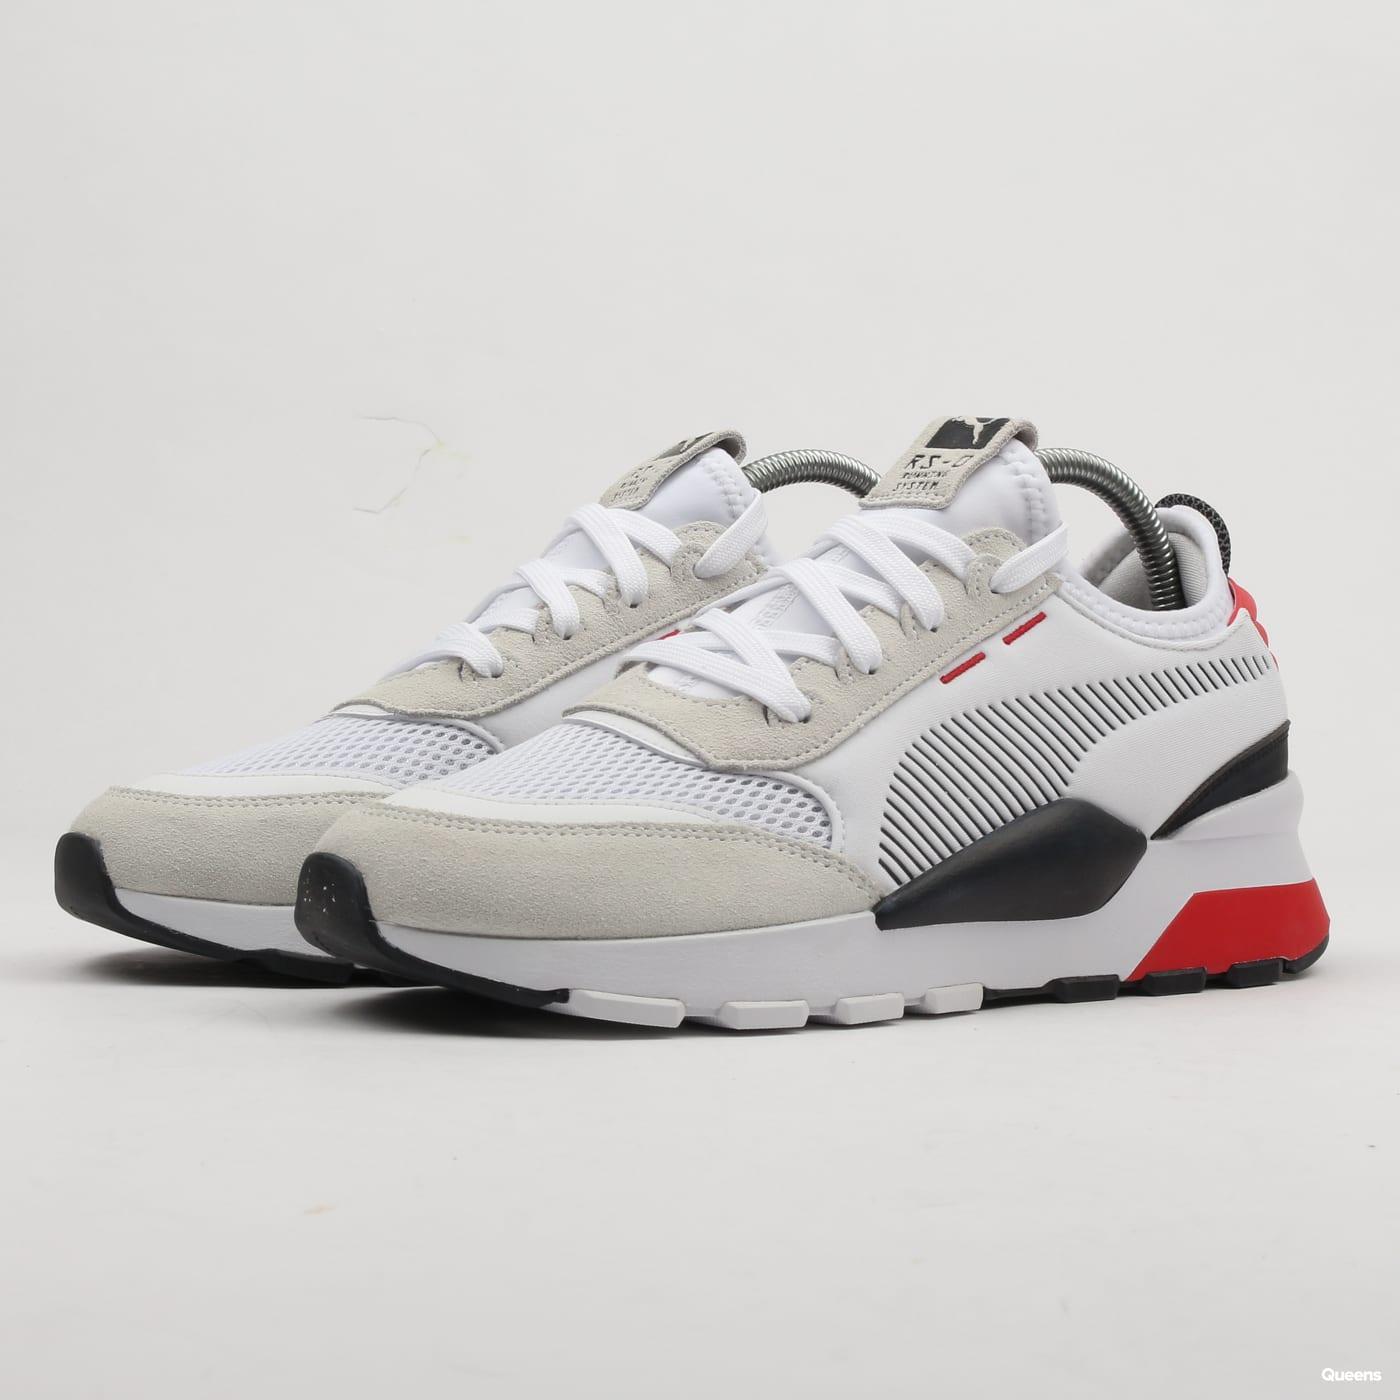 half off 4847f 6ccba Sneakers Puma RS-0 Winter INJ Toys (369469 01)– Queens 💚